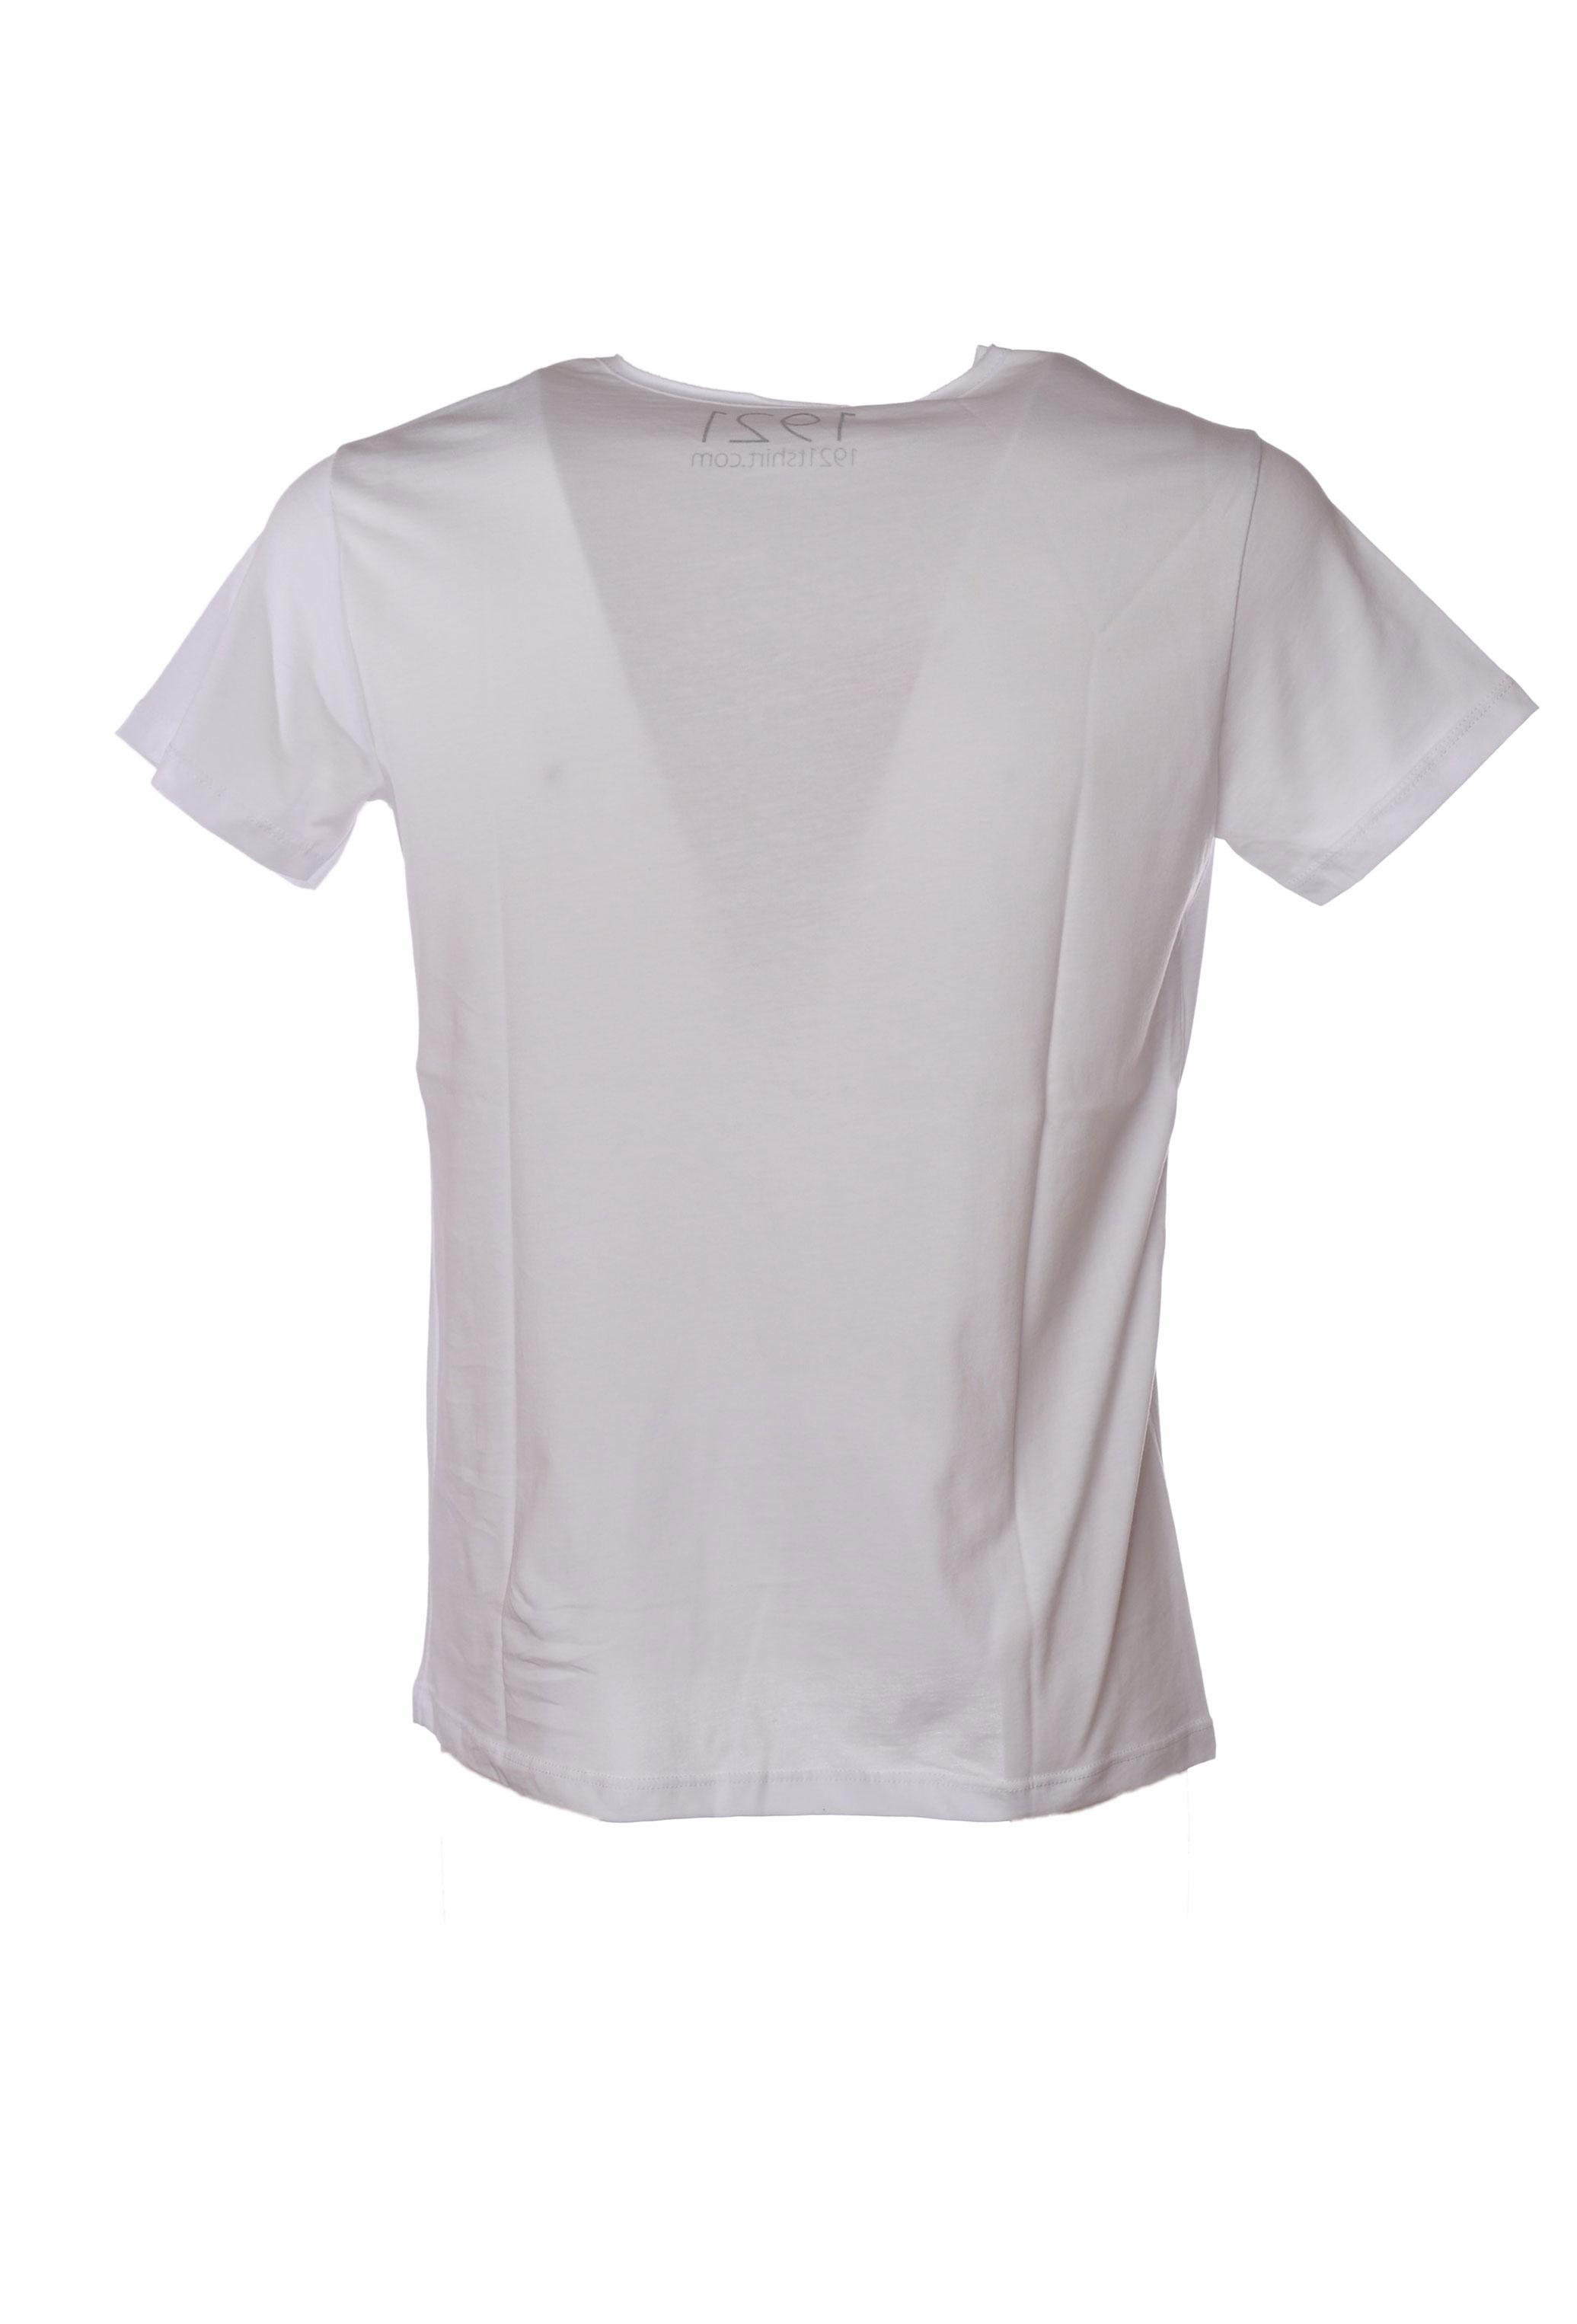 1921 - T-shirts